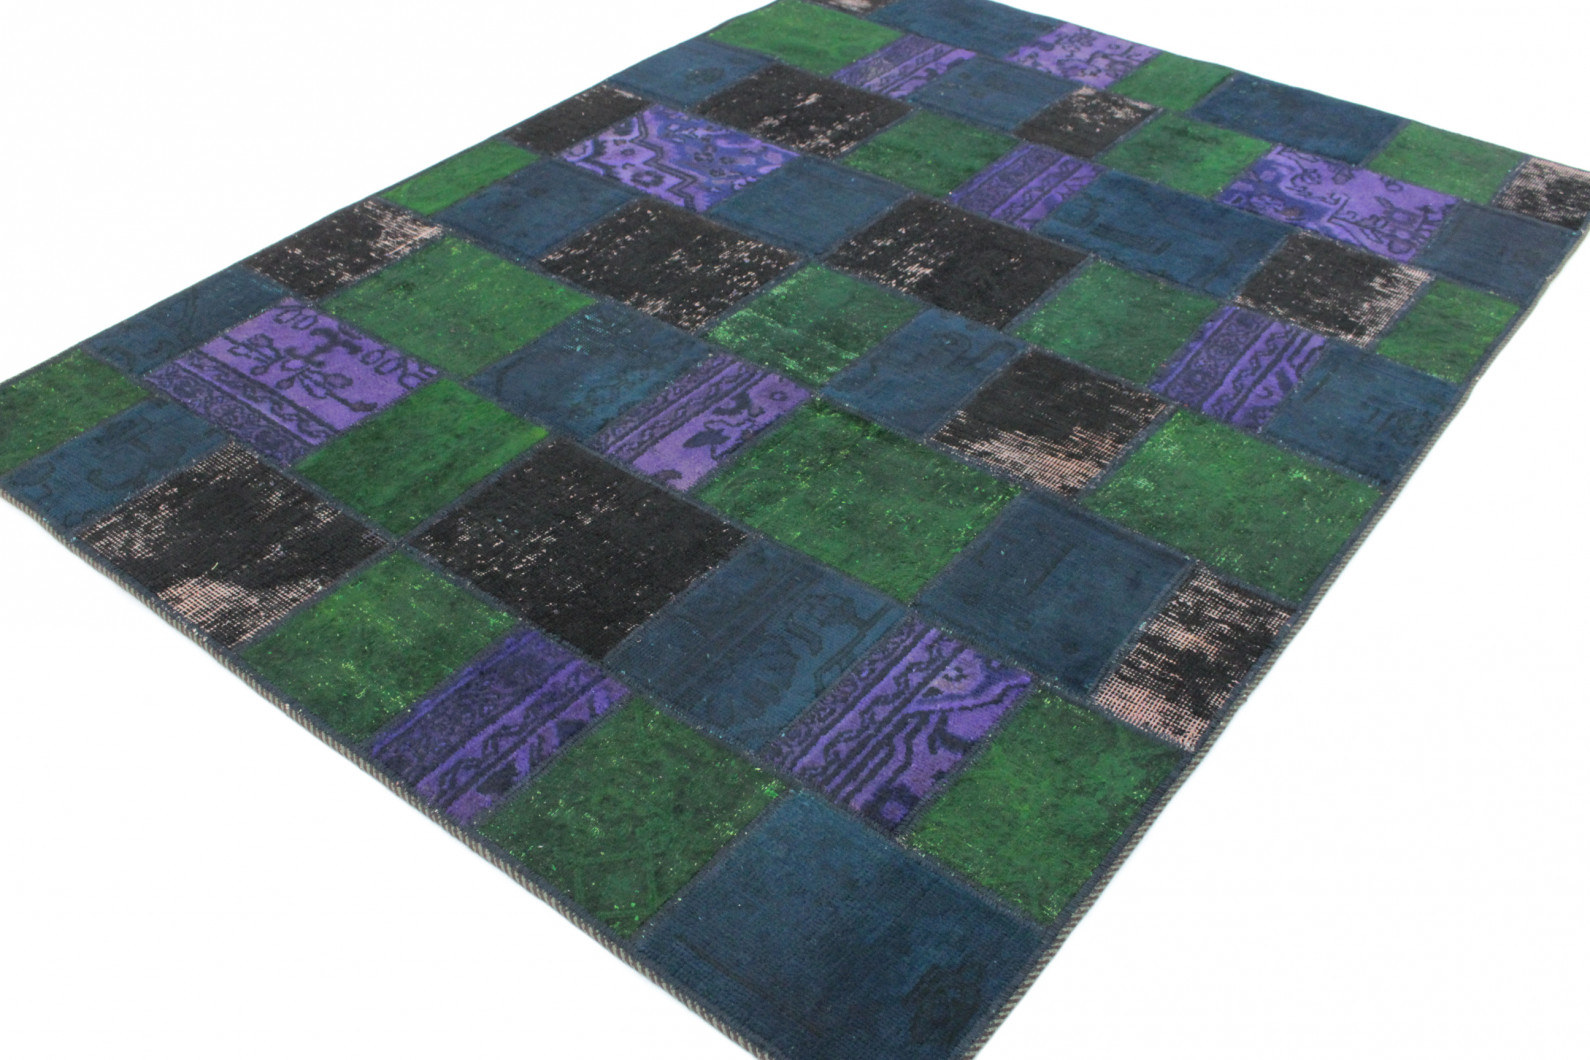 patchwork teppich gr n lila schwarz blau in 210x150 1001. Black Bedroom Furniture Sets. Home Design Ideas